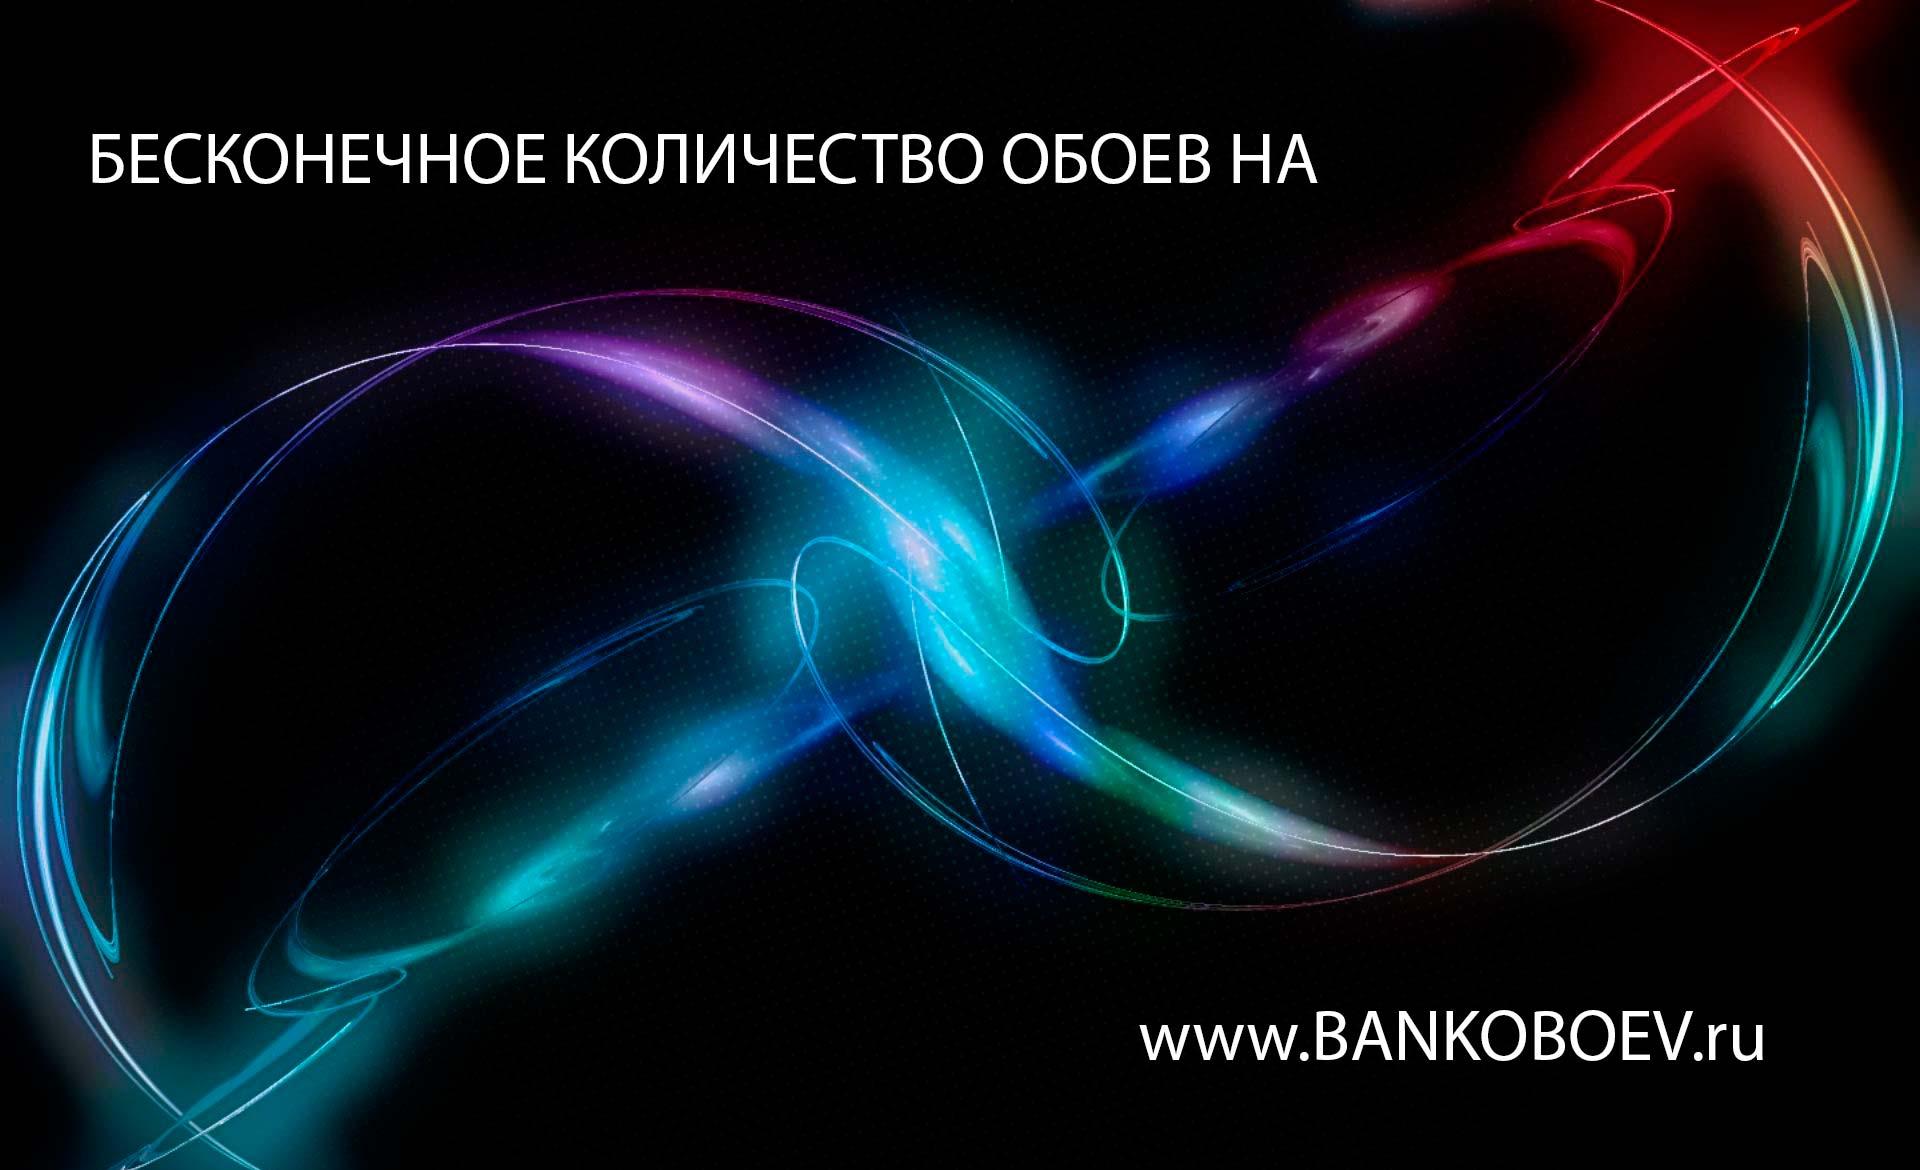 Source httpwwwbankoboevruimagesOTEyOTIBankoboevRu motokross 1280x1024